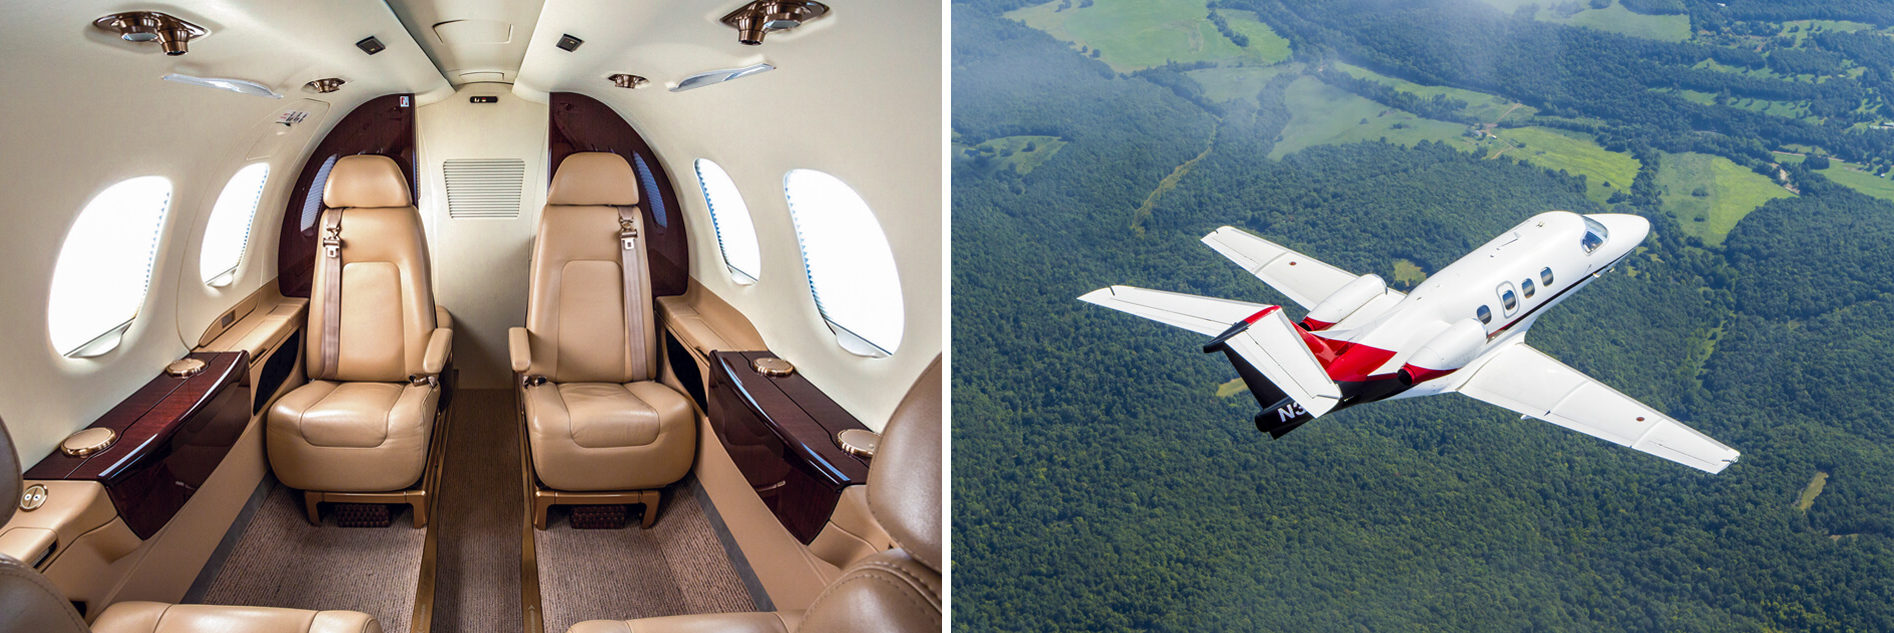 Embraer Phenom 100 Interior and Aerial